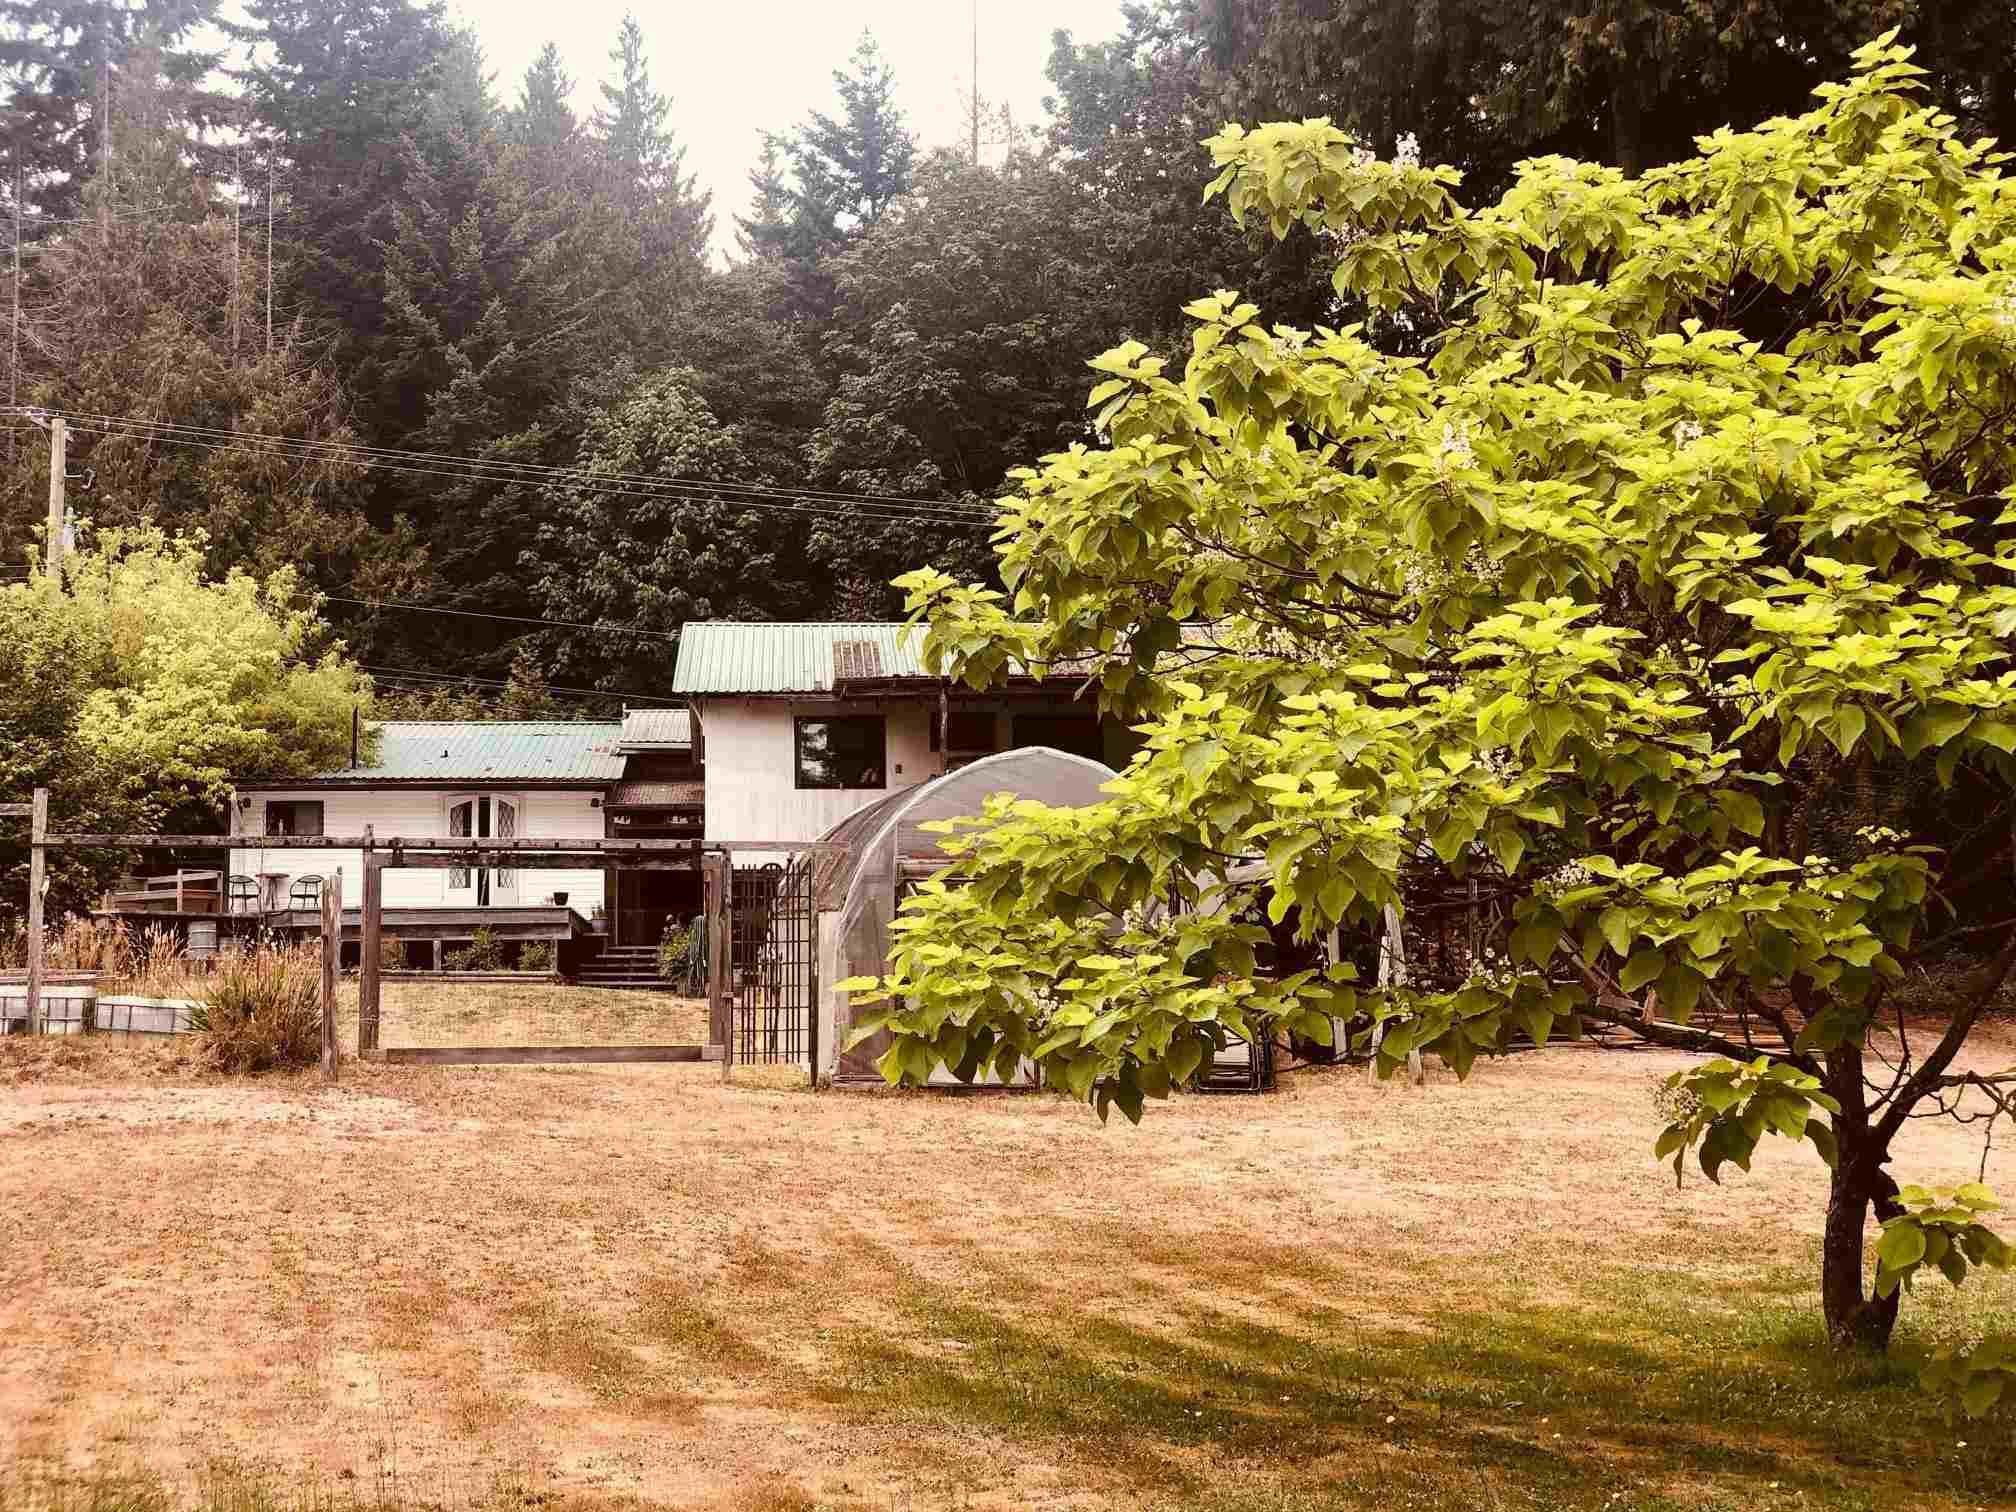 Main Photo: 2897 SUNSHINE COAST Highway: Roberts Creek House for sale (Sunshine Coast)  : MLS®# R2602692